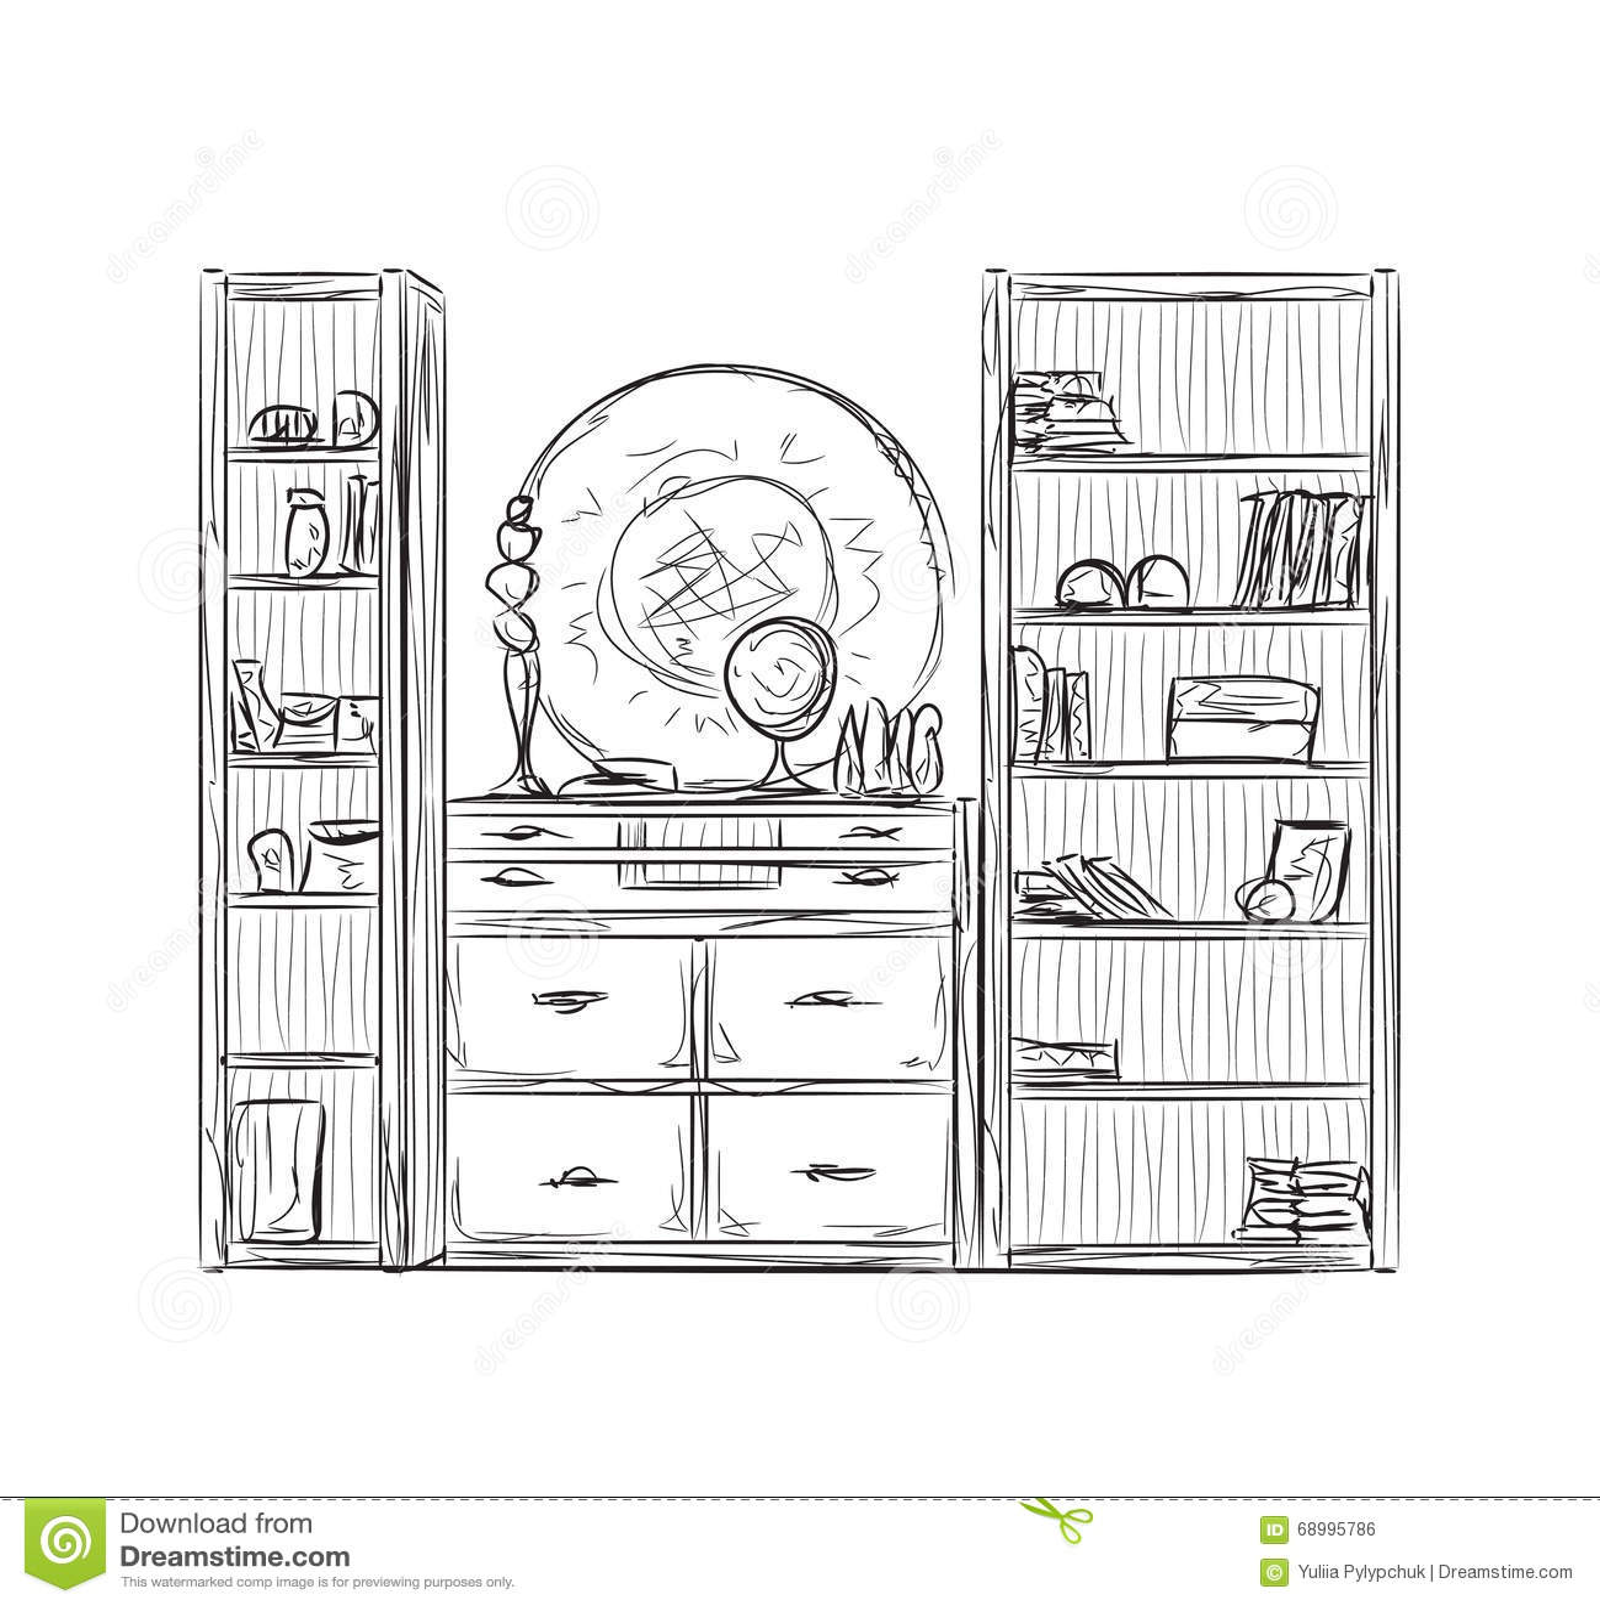 kitchen shelf decor base cabinets for sale 厨房碗柜 厨房架子家具向量例证 插画包括有线路 巴西 架子 装饰 厨房架子家具